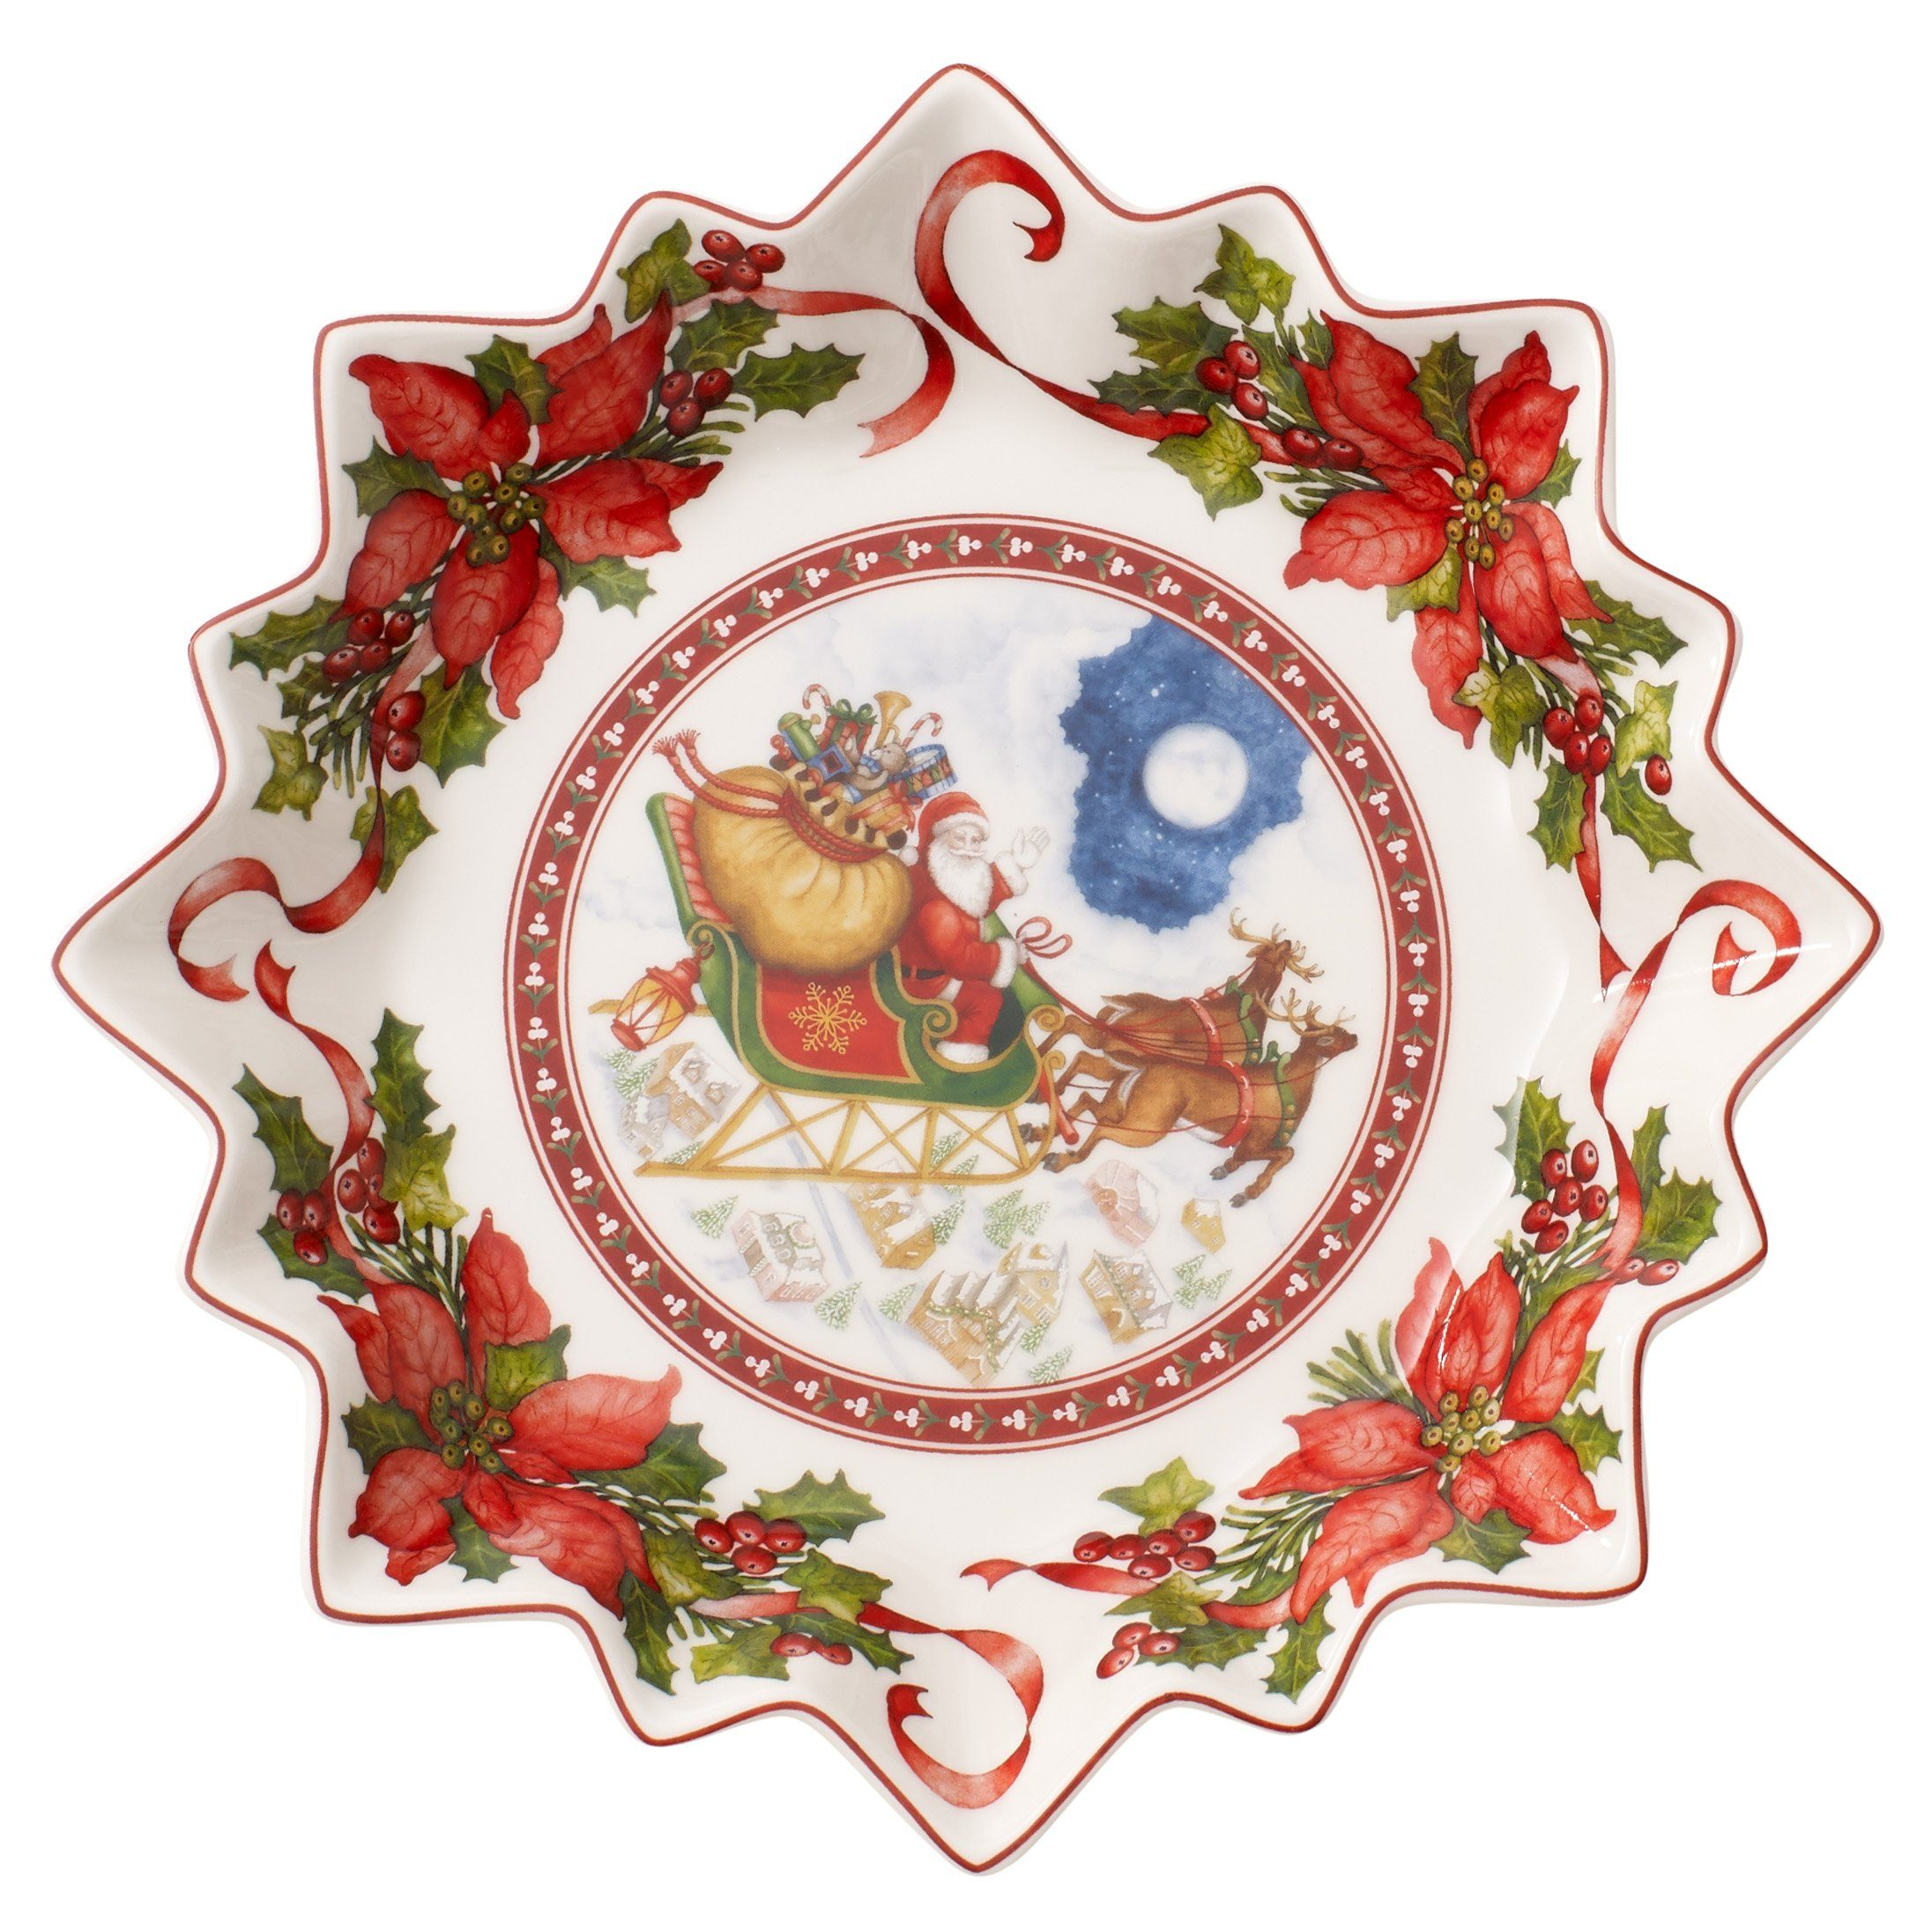 Villeroy & Boch Schale groß, Santas Flug »Toy's Fantasy«